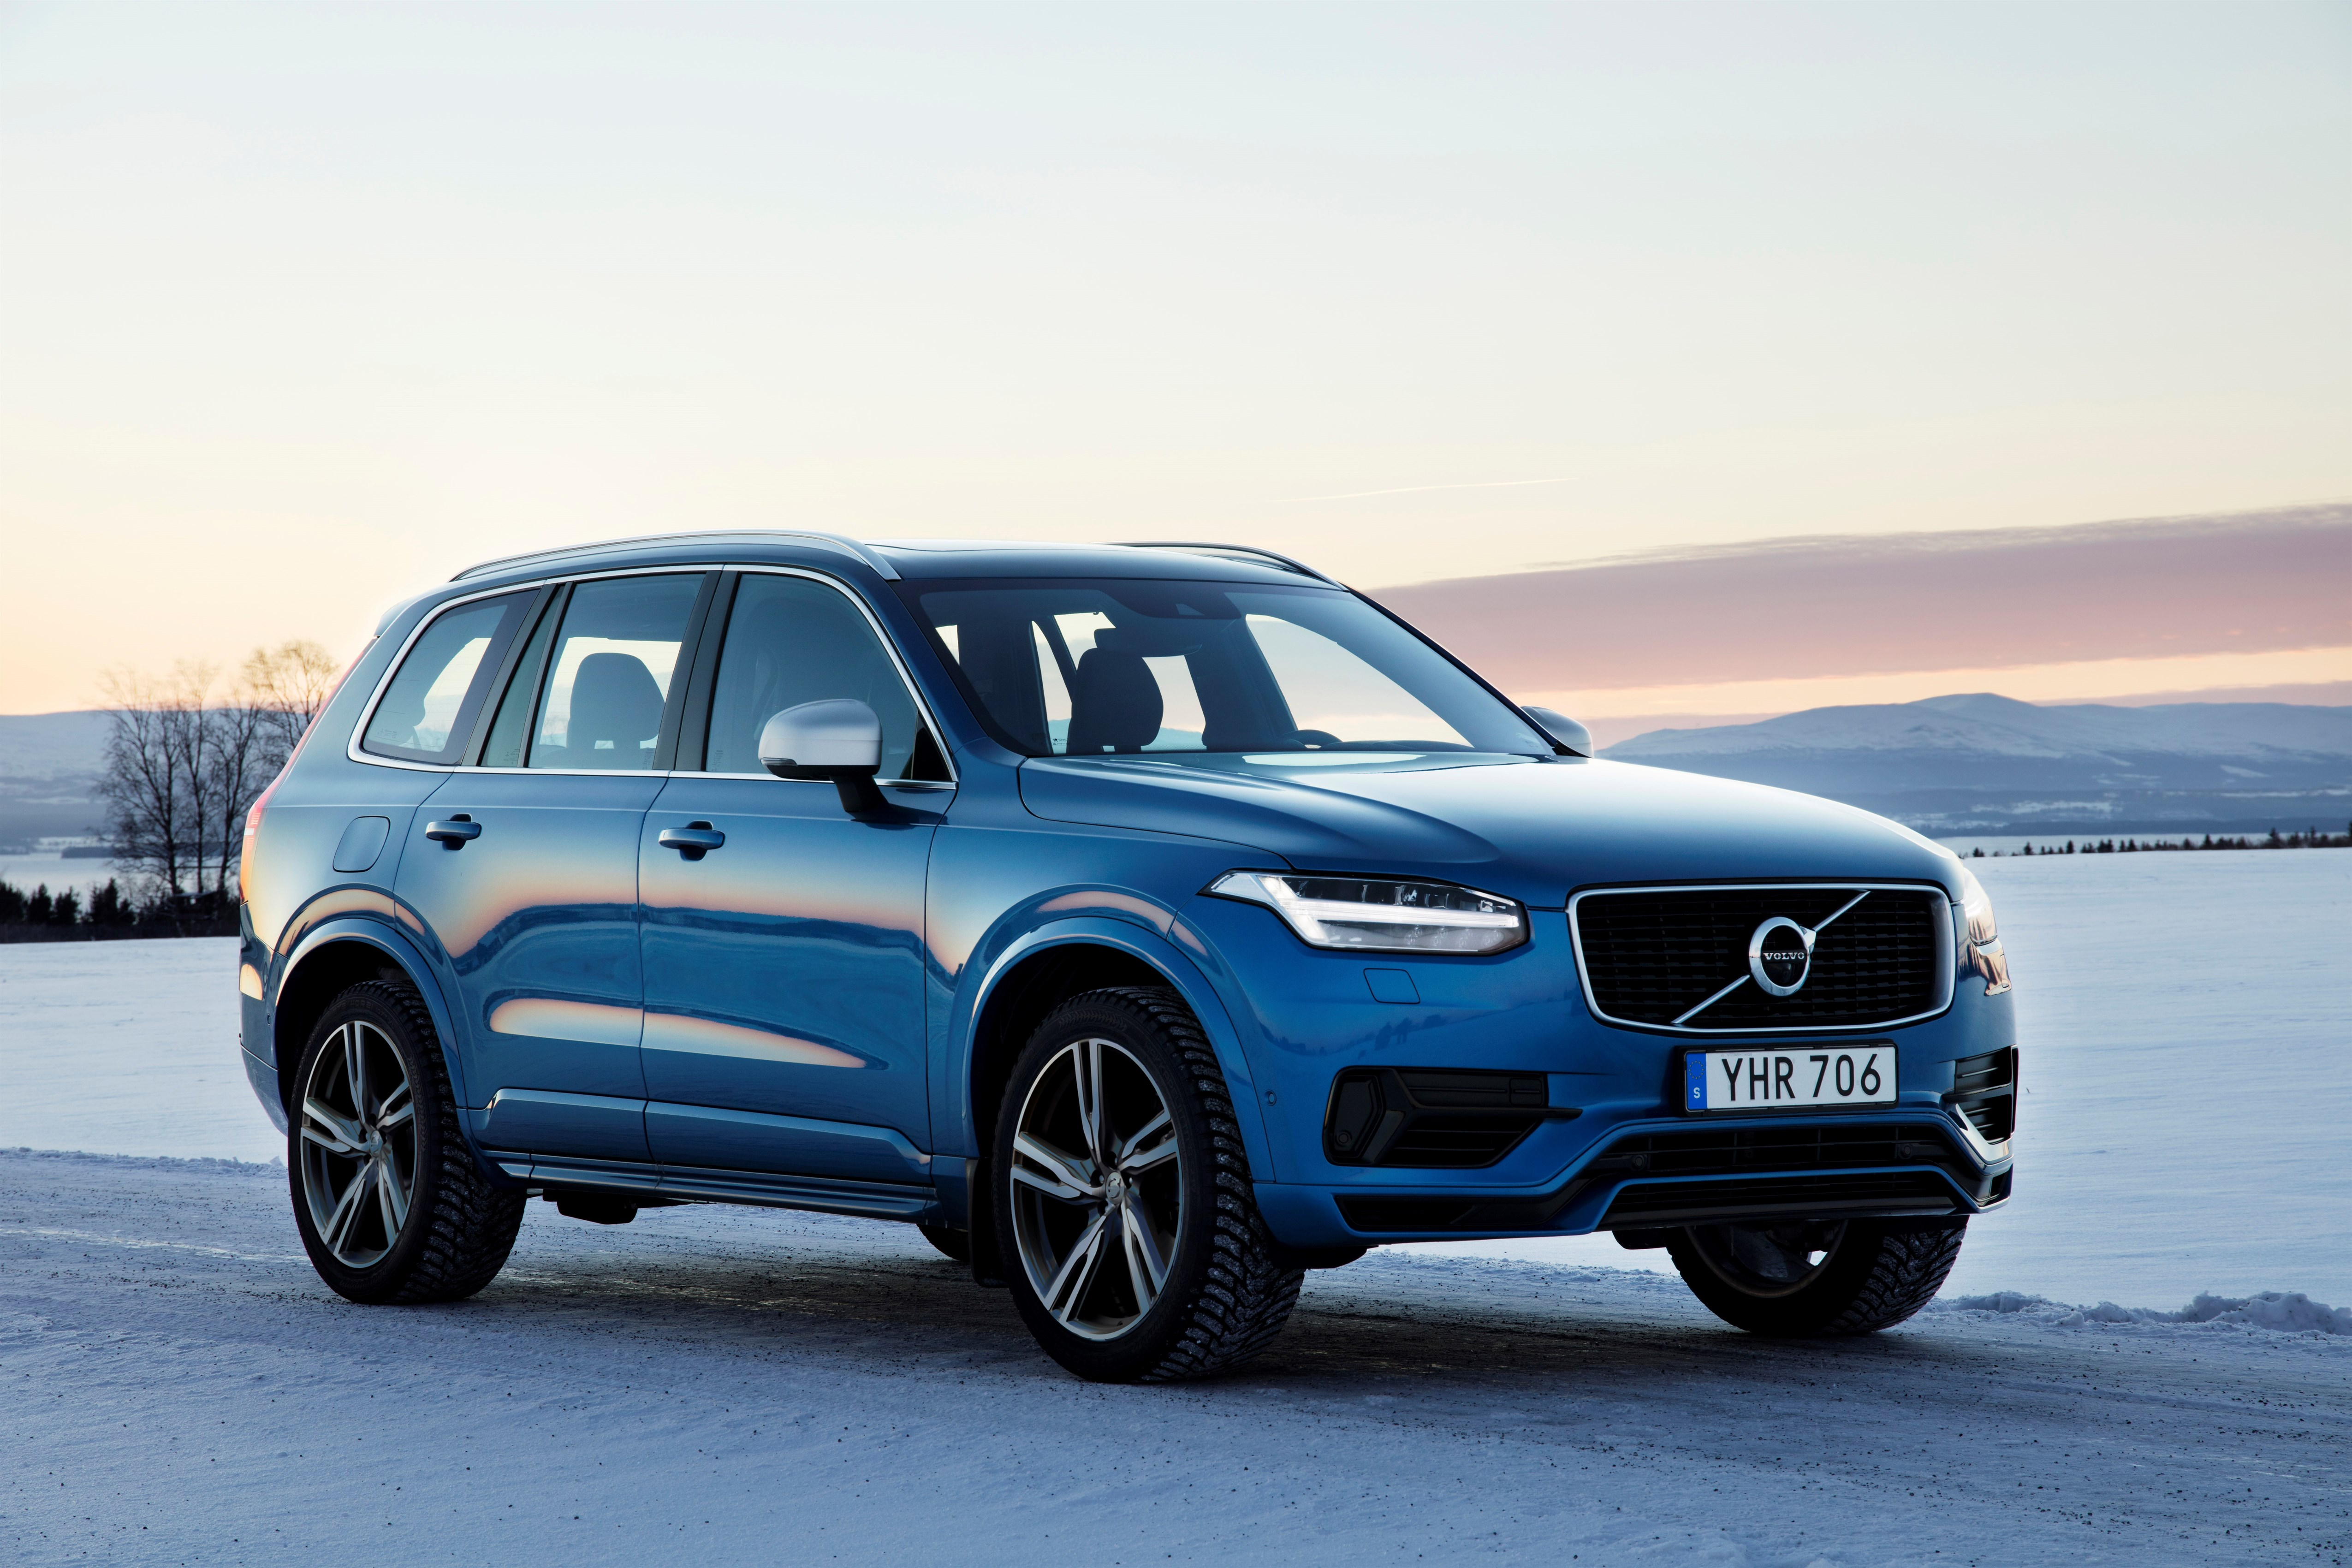 Volvo AWD Turns 20, V90 Cross Country Becomes the Getaway Car - autoevolution